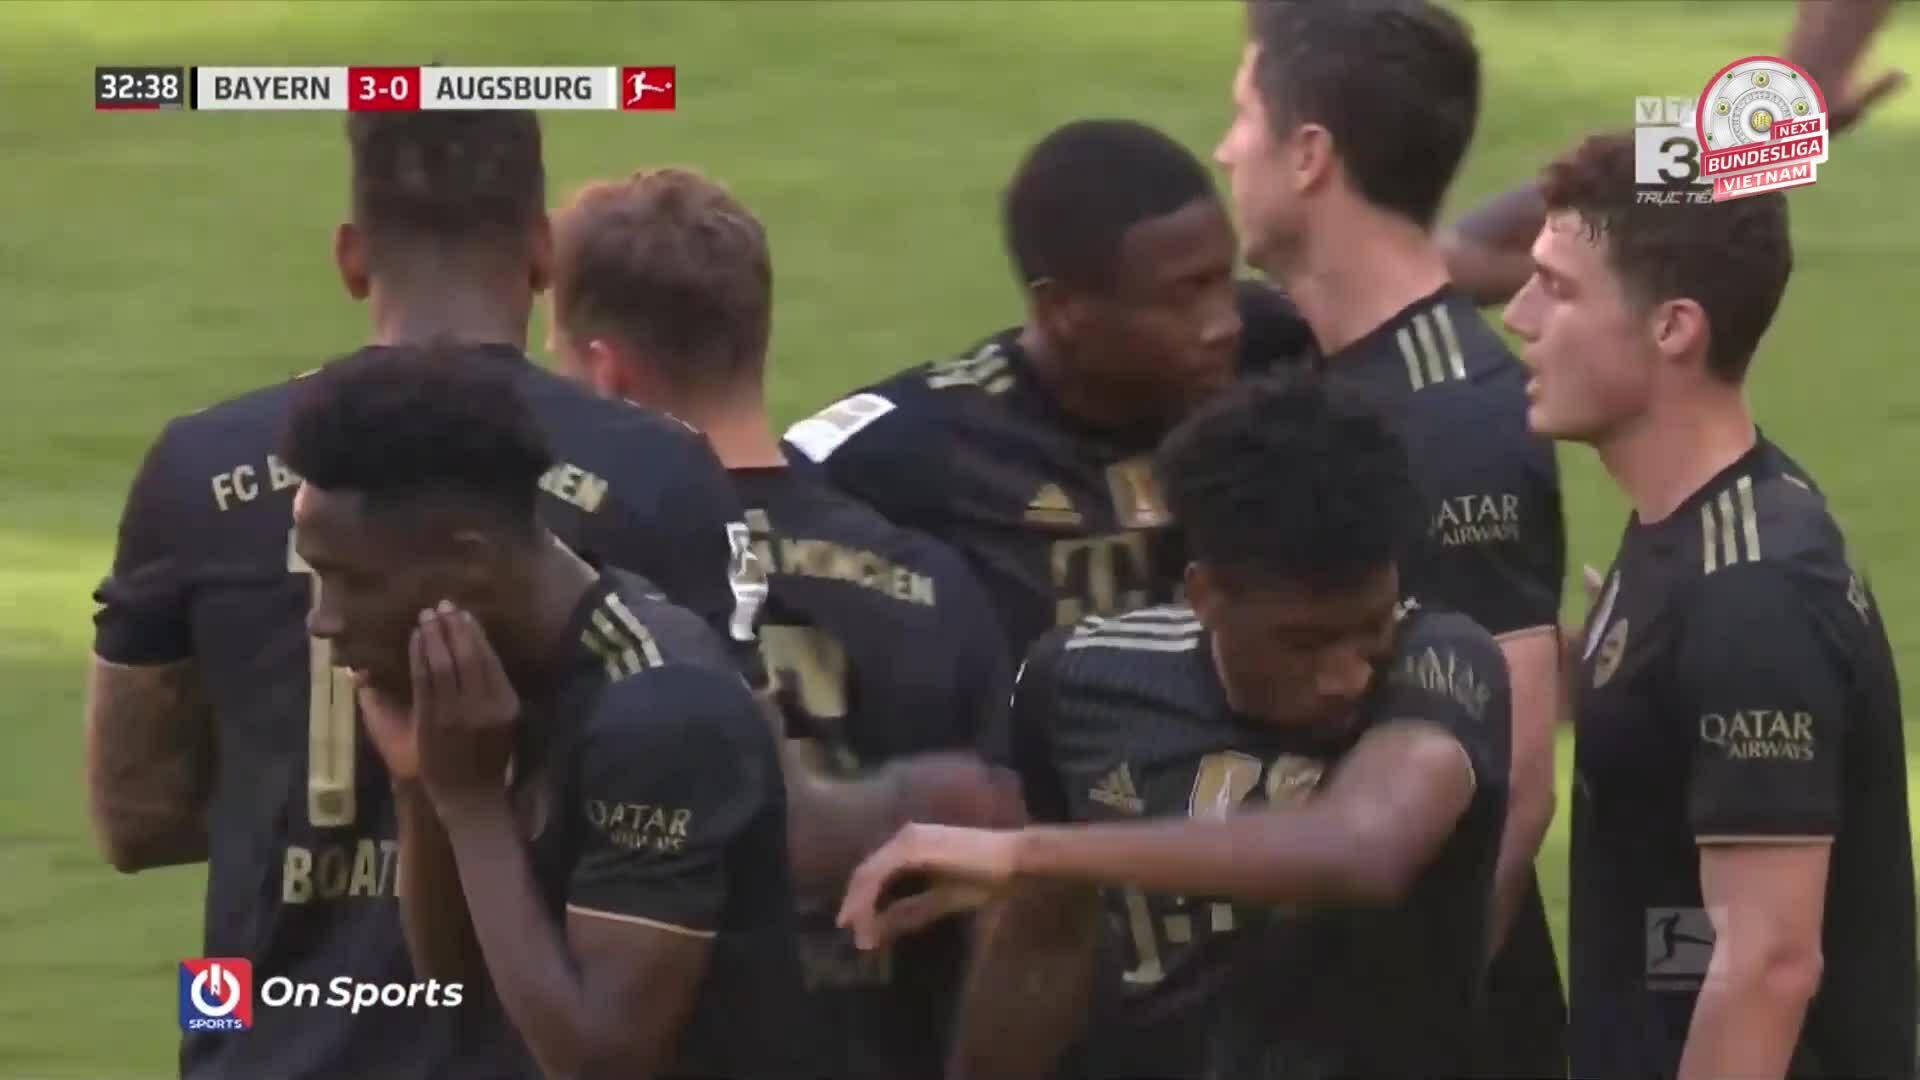 Bayern 5-2 Augsburg